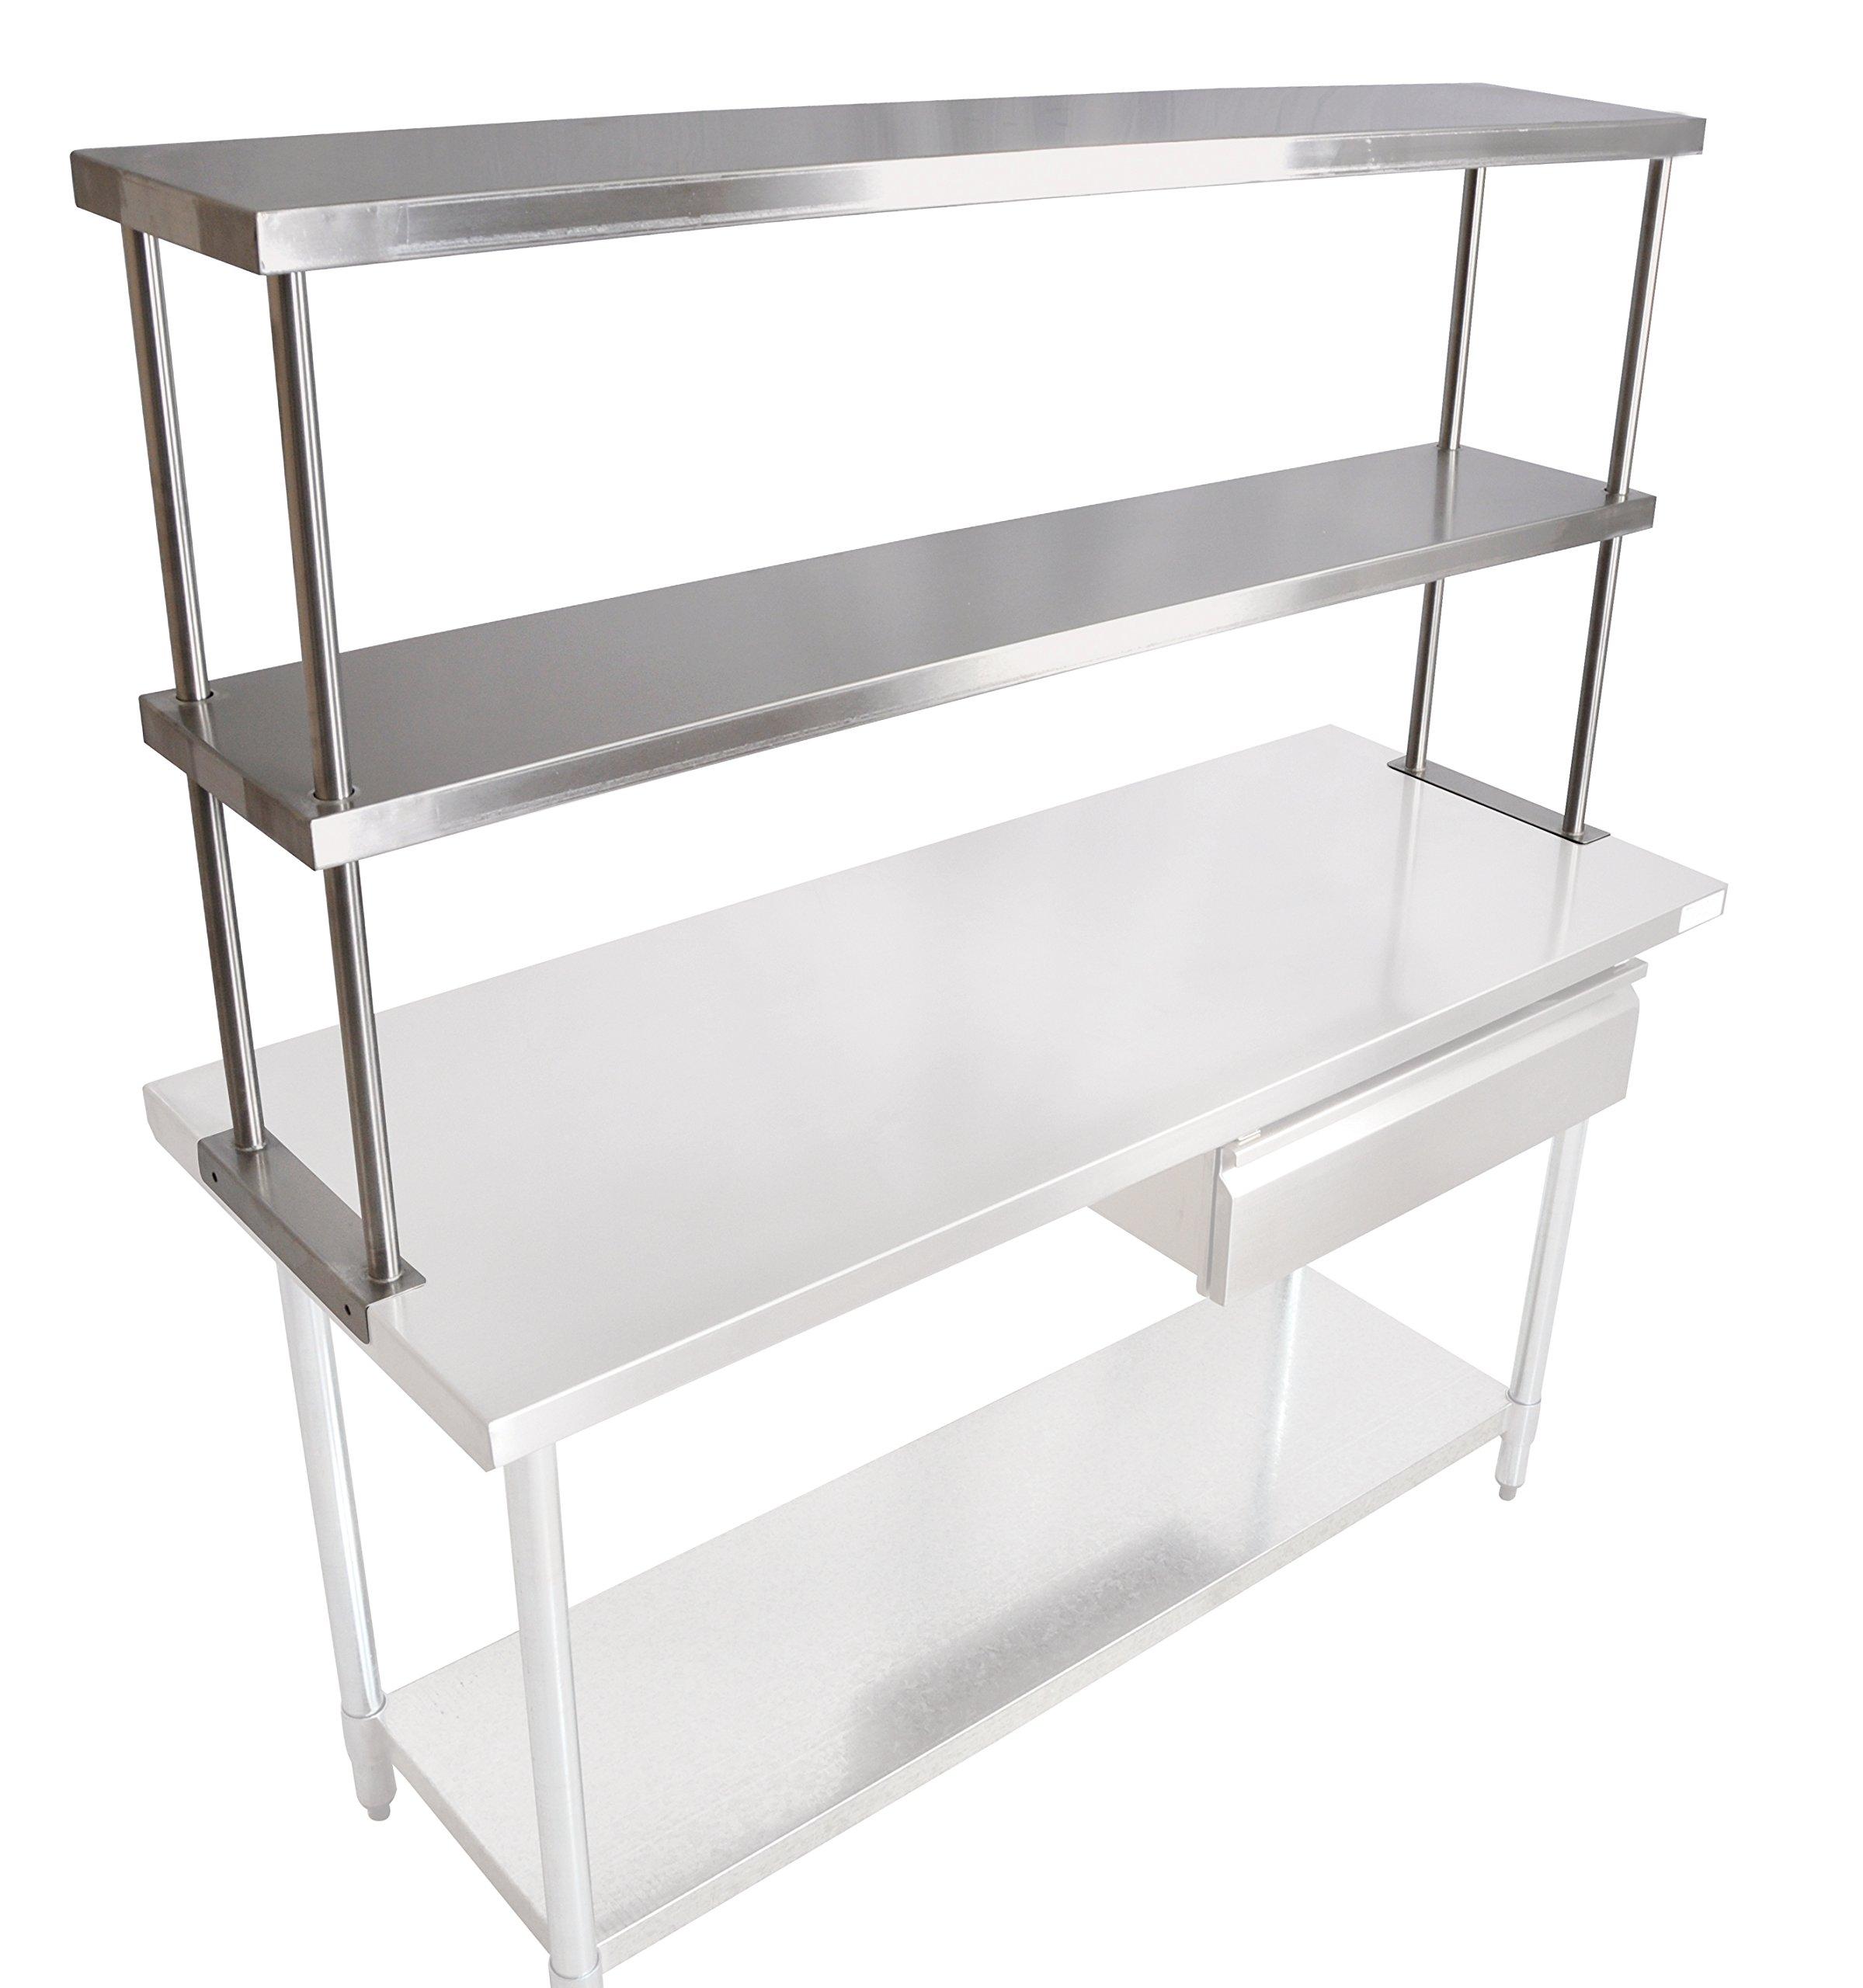 John Boos OS-ED-1260 Stainless Steel 430 Economy Double Overshelf, 60'' Length x 12'' Width